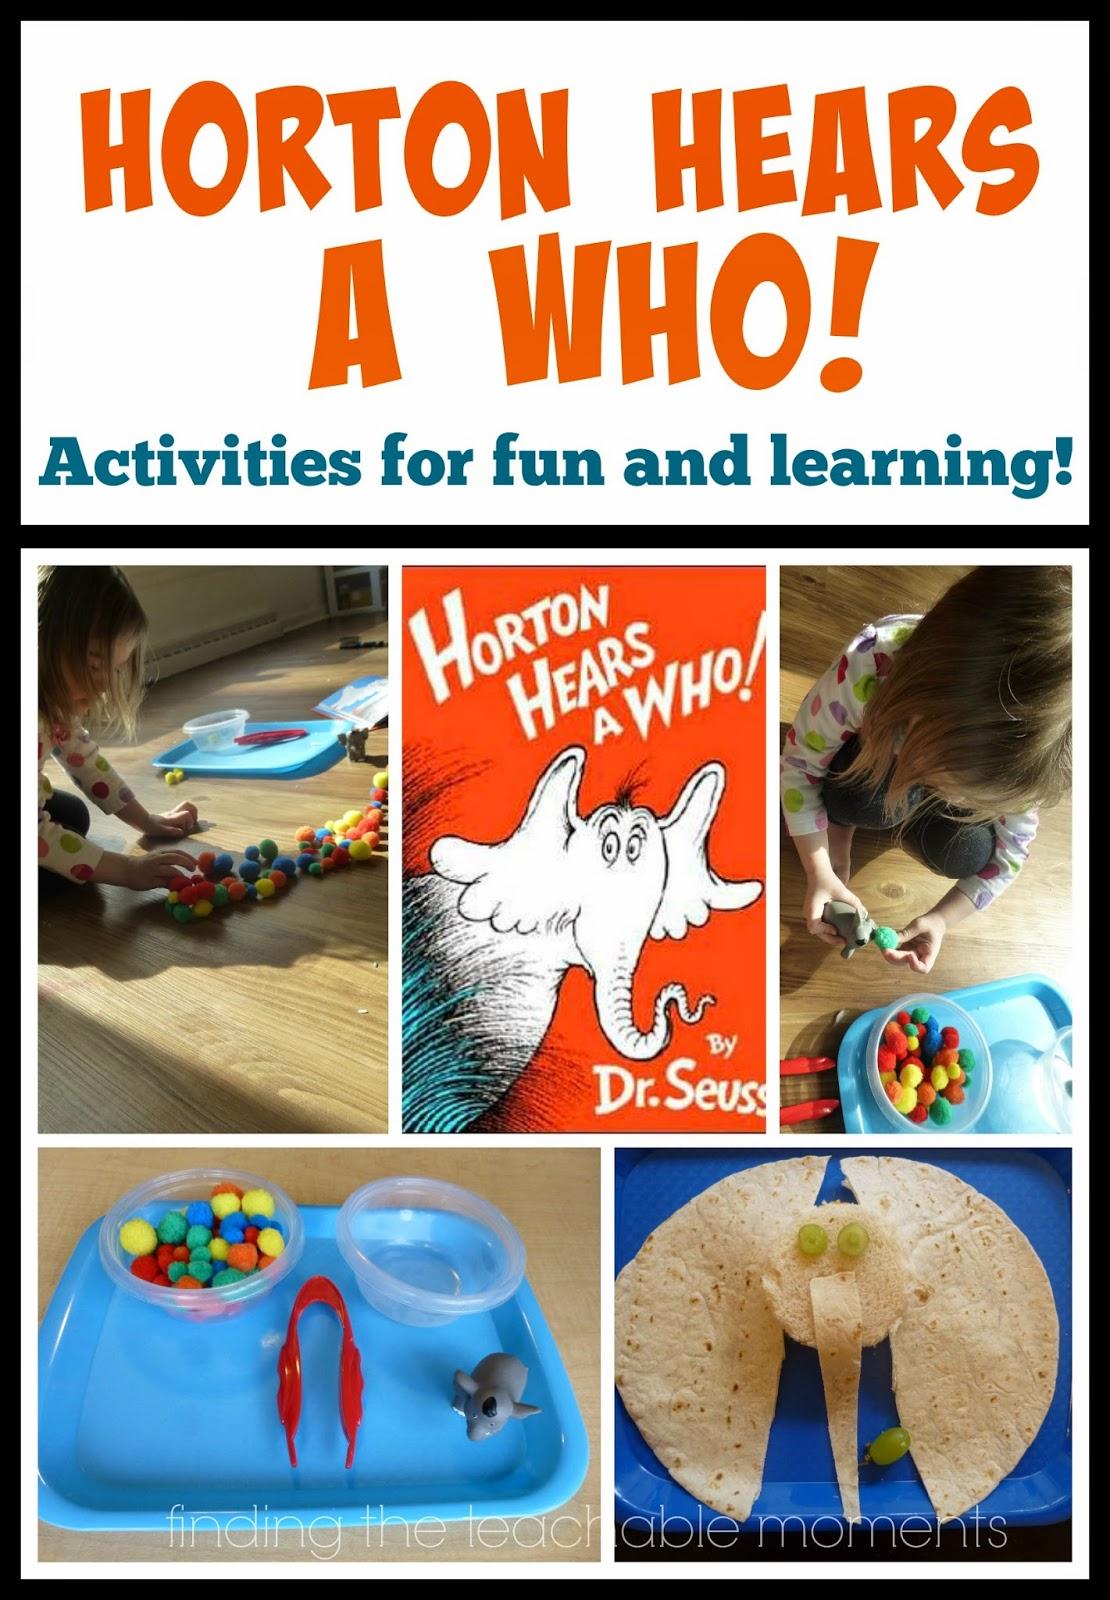 Horton Hears a Who! Activities